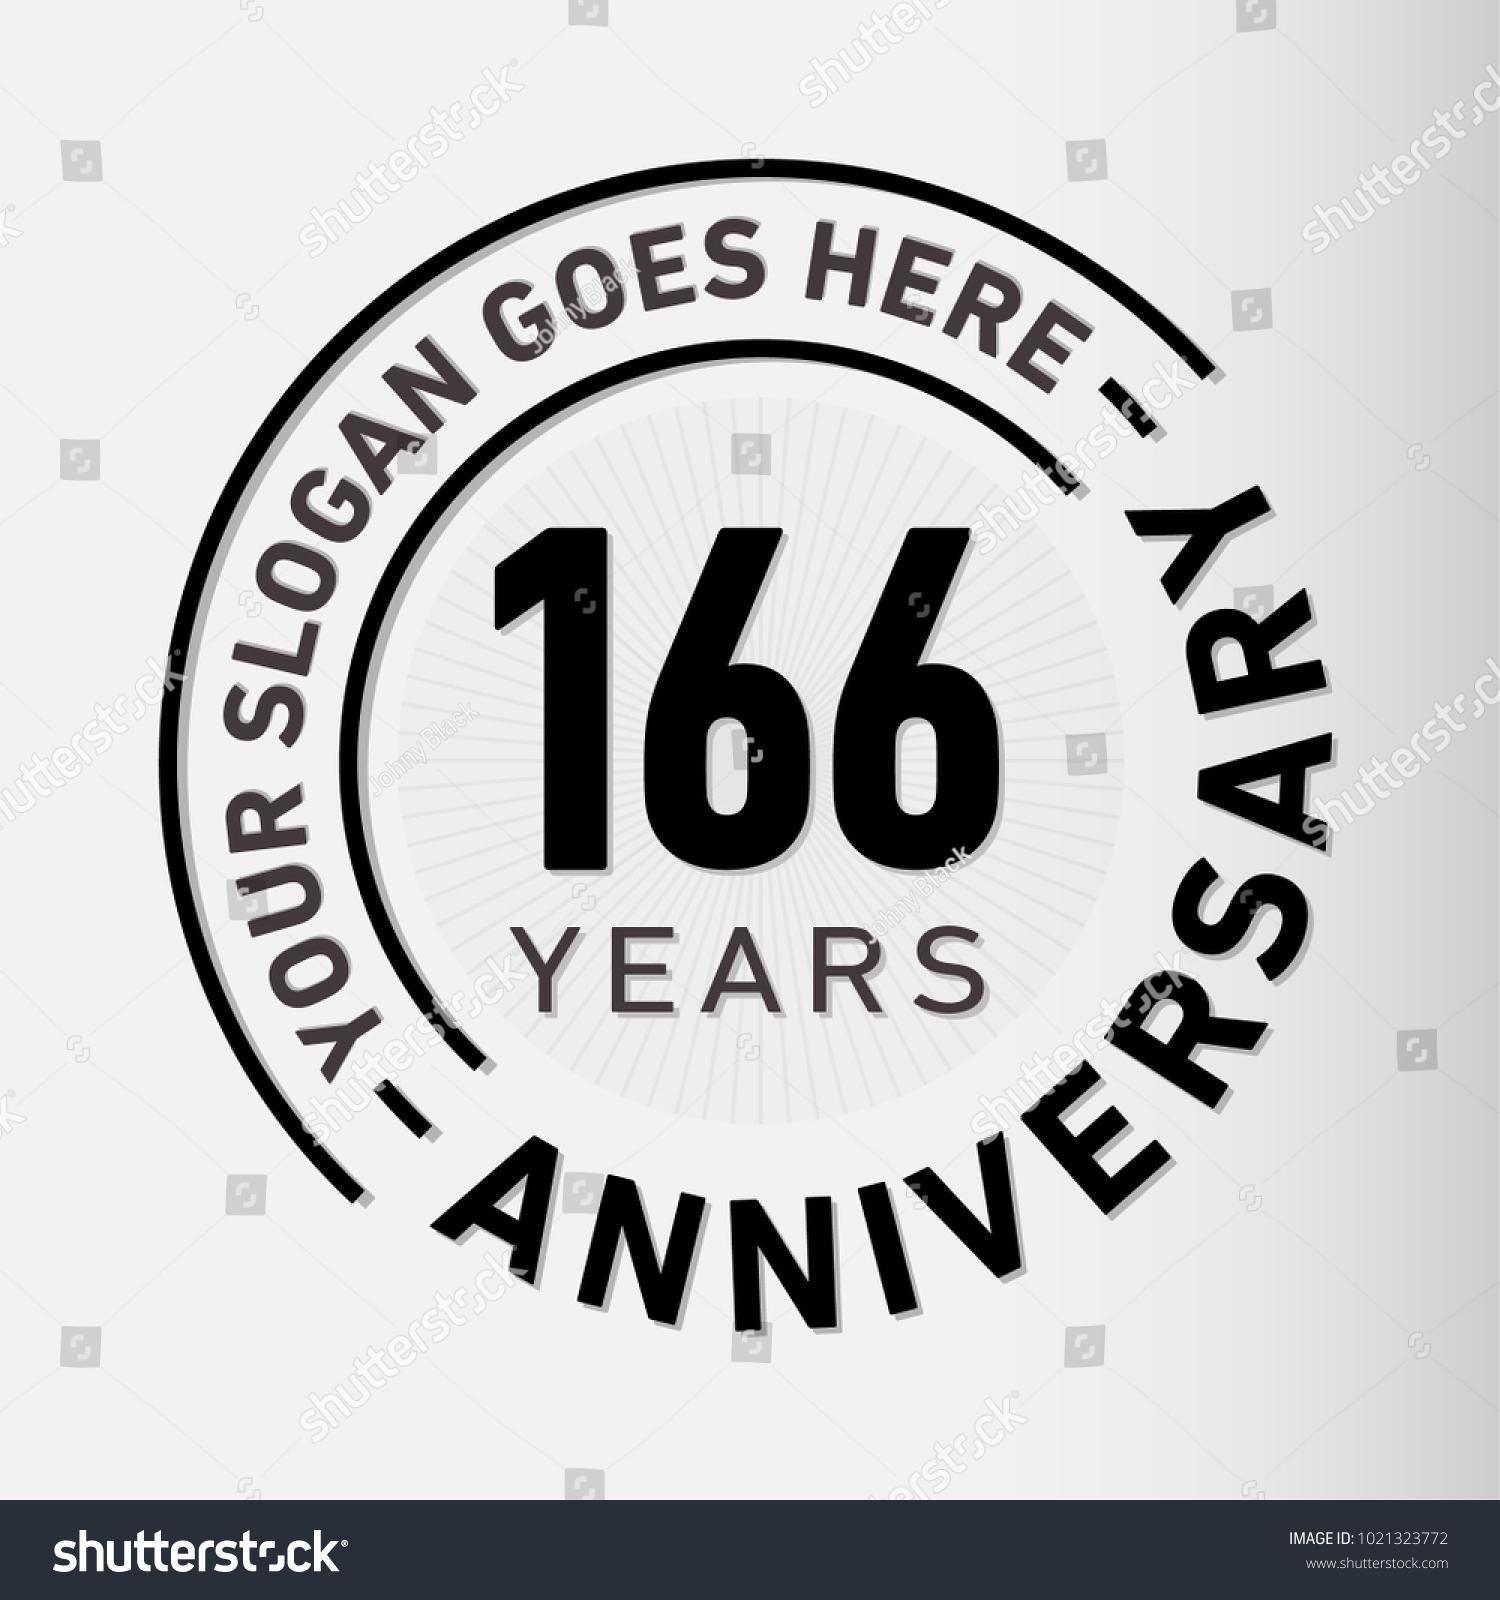 166 years anniversary logo template vector のベクター画像素材